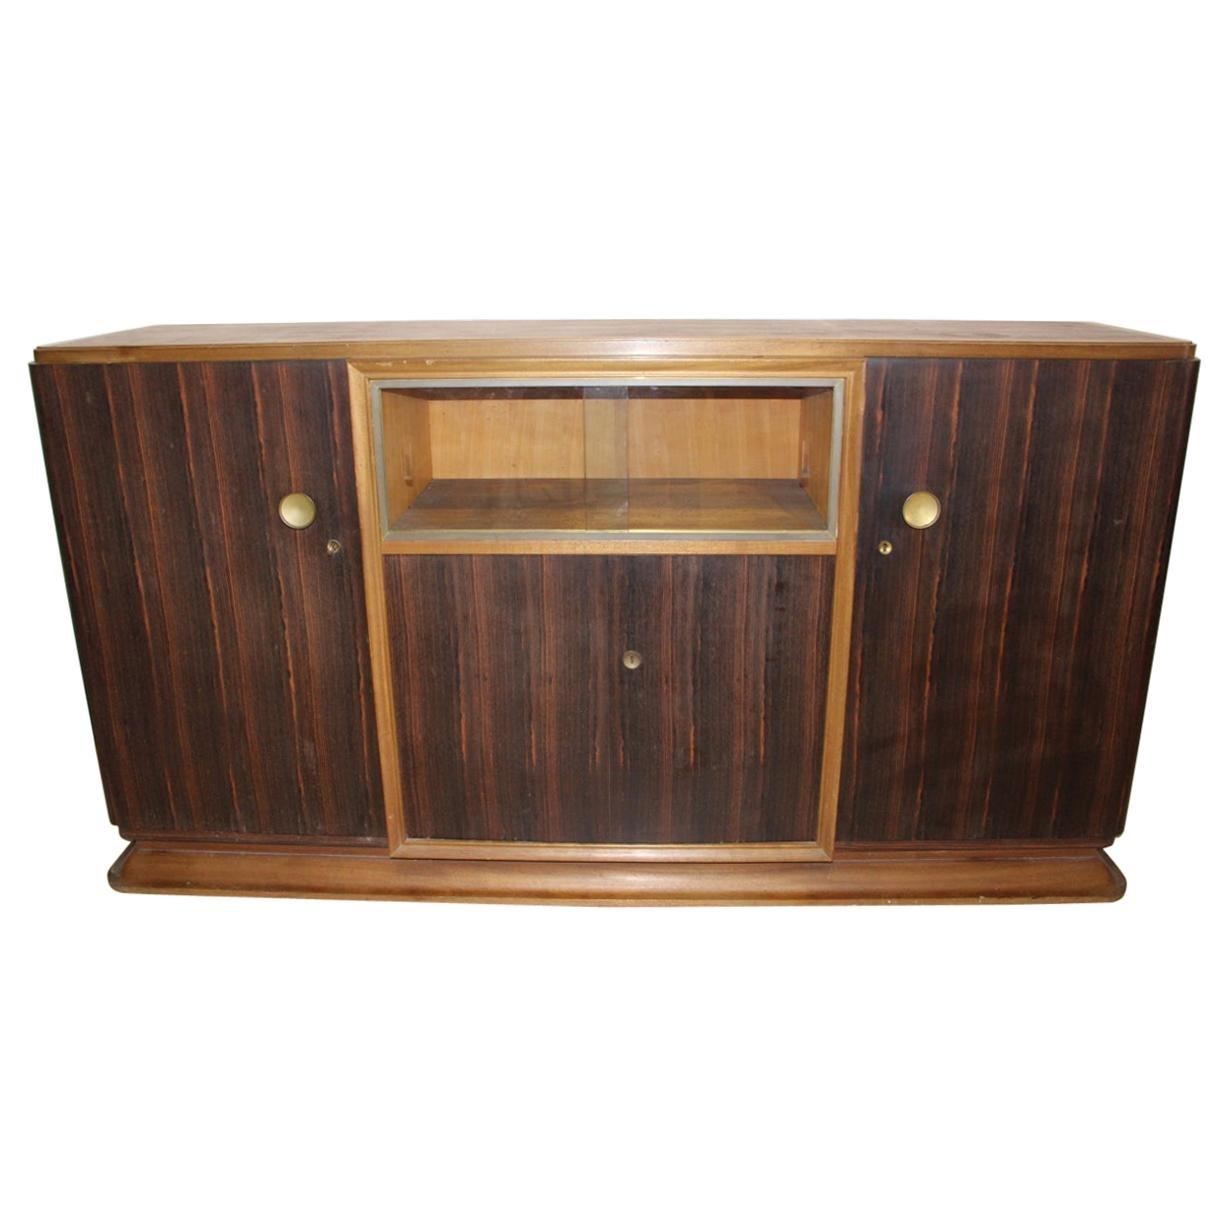 Art Deco Sideboard in Macassar Attributed to Auguste Vallin